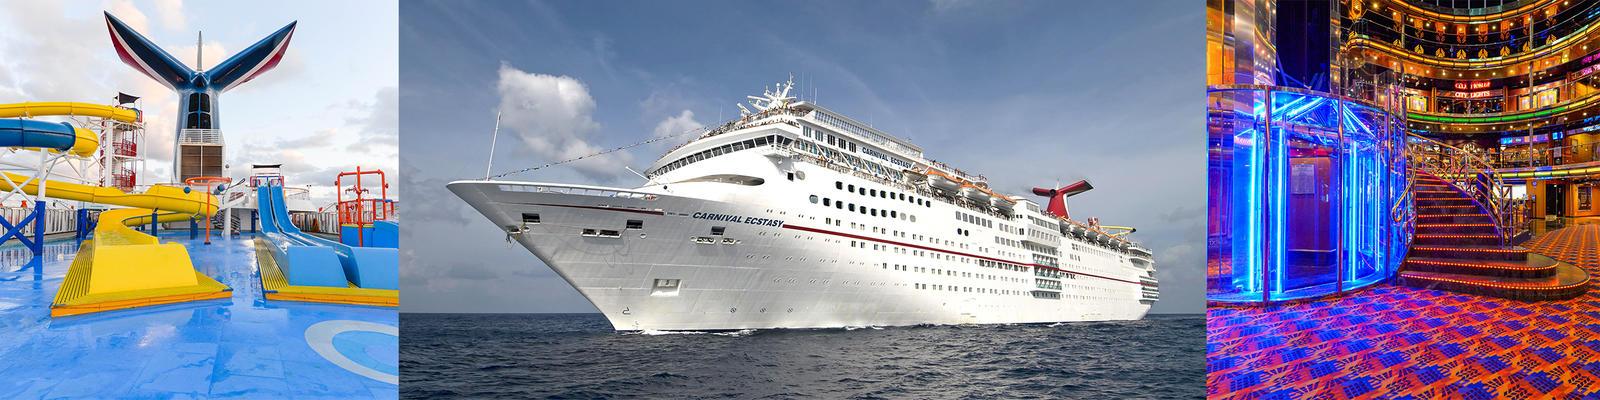 Carnival Ecstasy Cruise Ship Review Photos Amp Departure